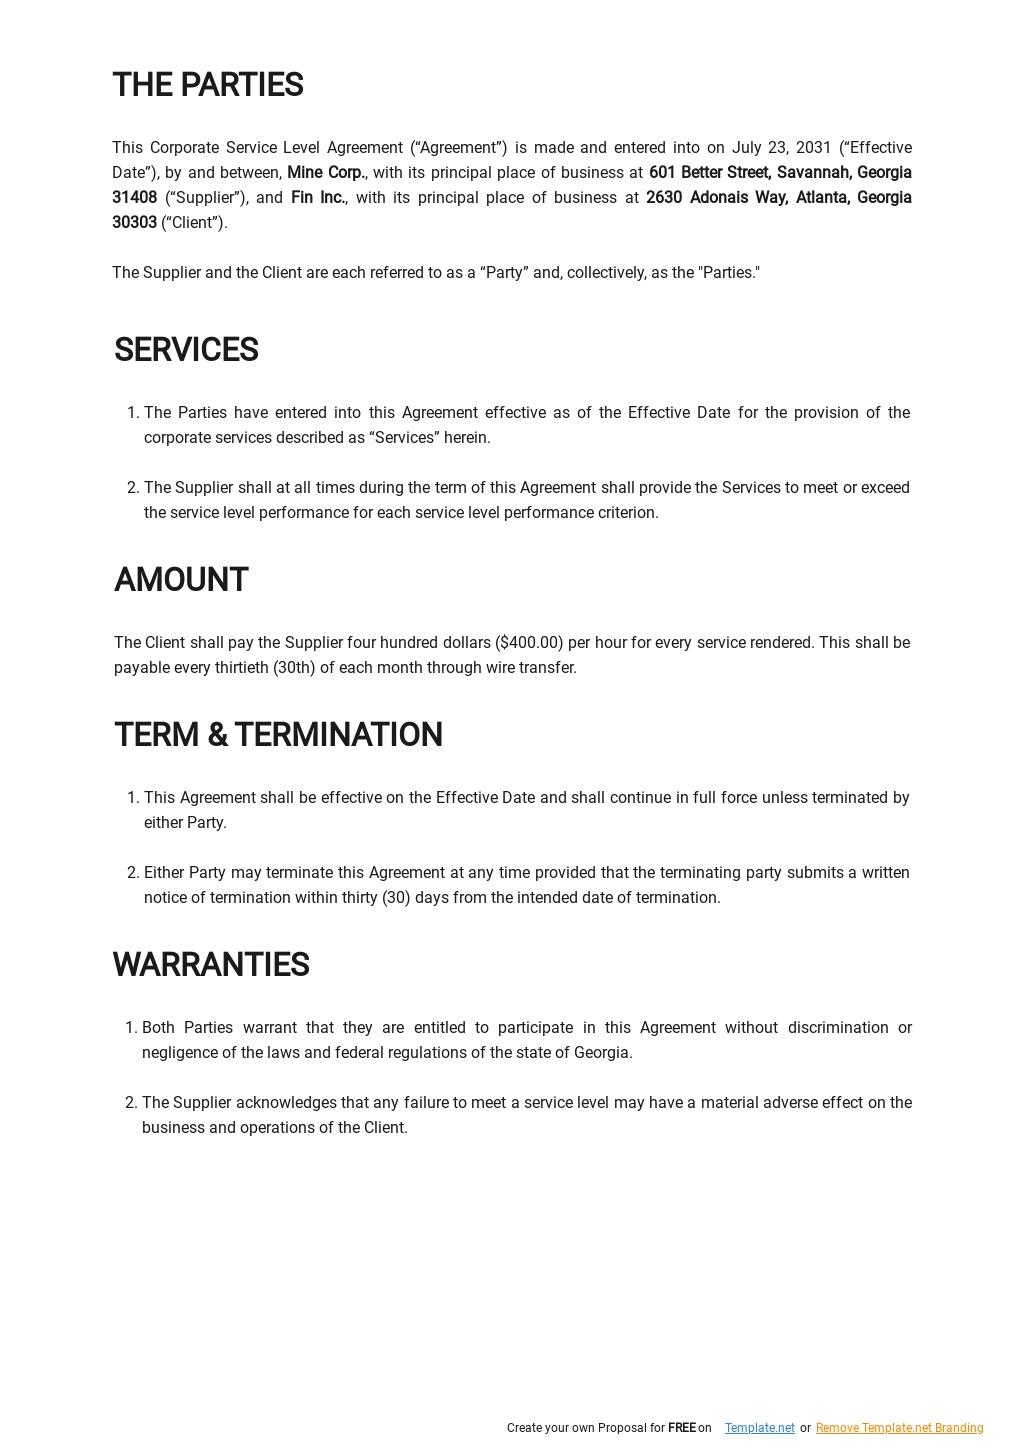 Free Corporate Service Level Agreement Template 1.jpe